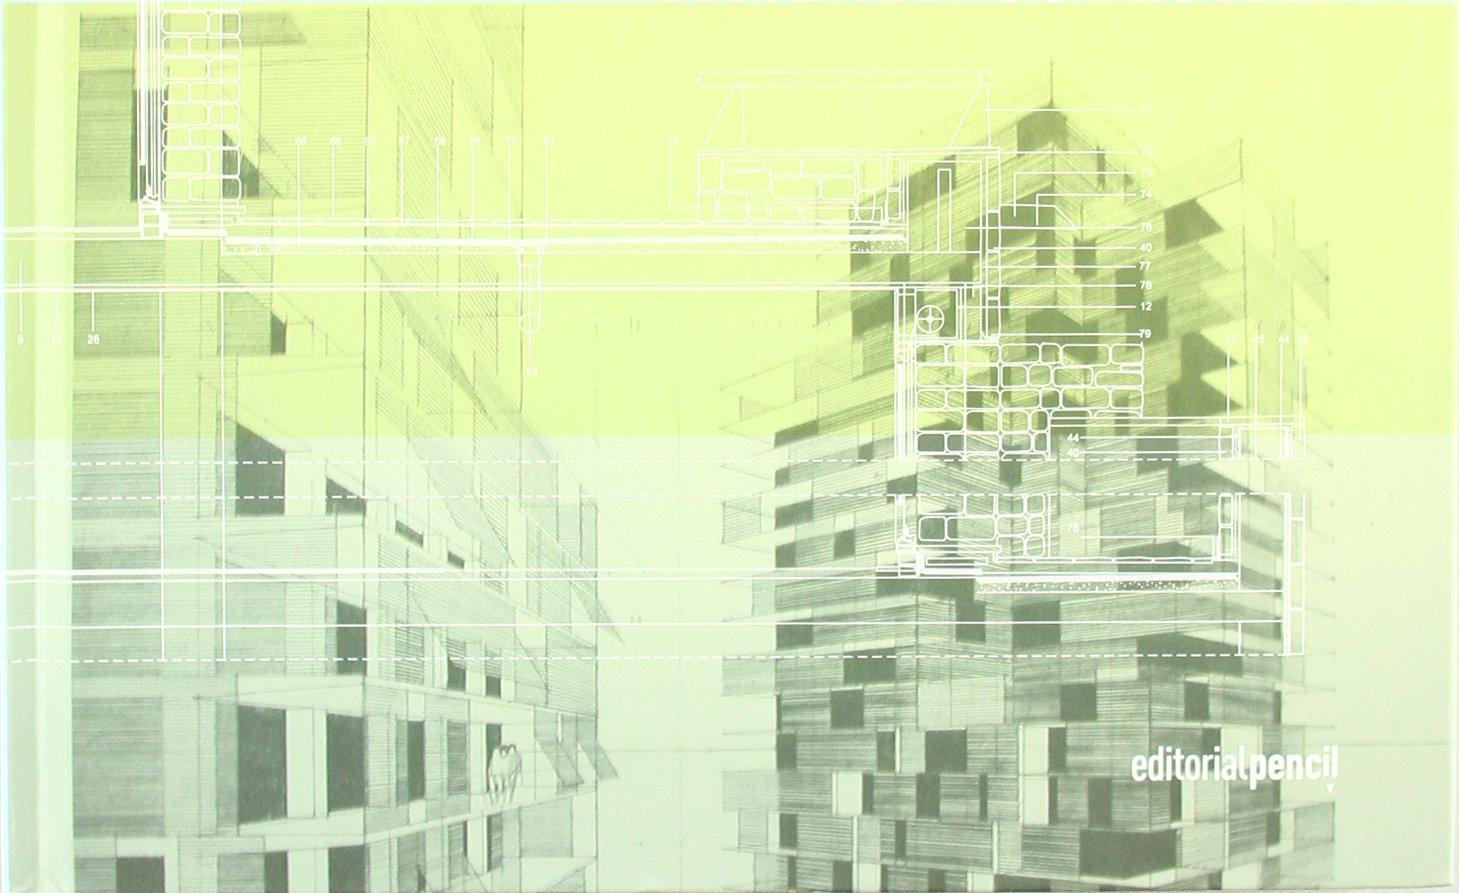 Vivienda Colectiva 04 (Arquitectura Contemporanea): Amazon.es: Giménez Crespo, Antonio, Monzonis Pozo, Conchi: Libros